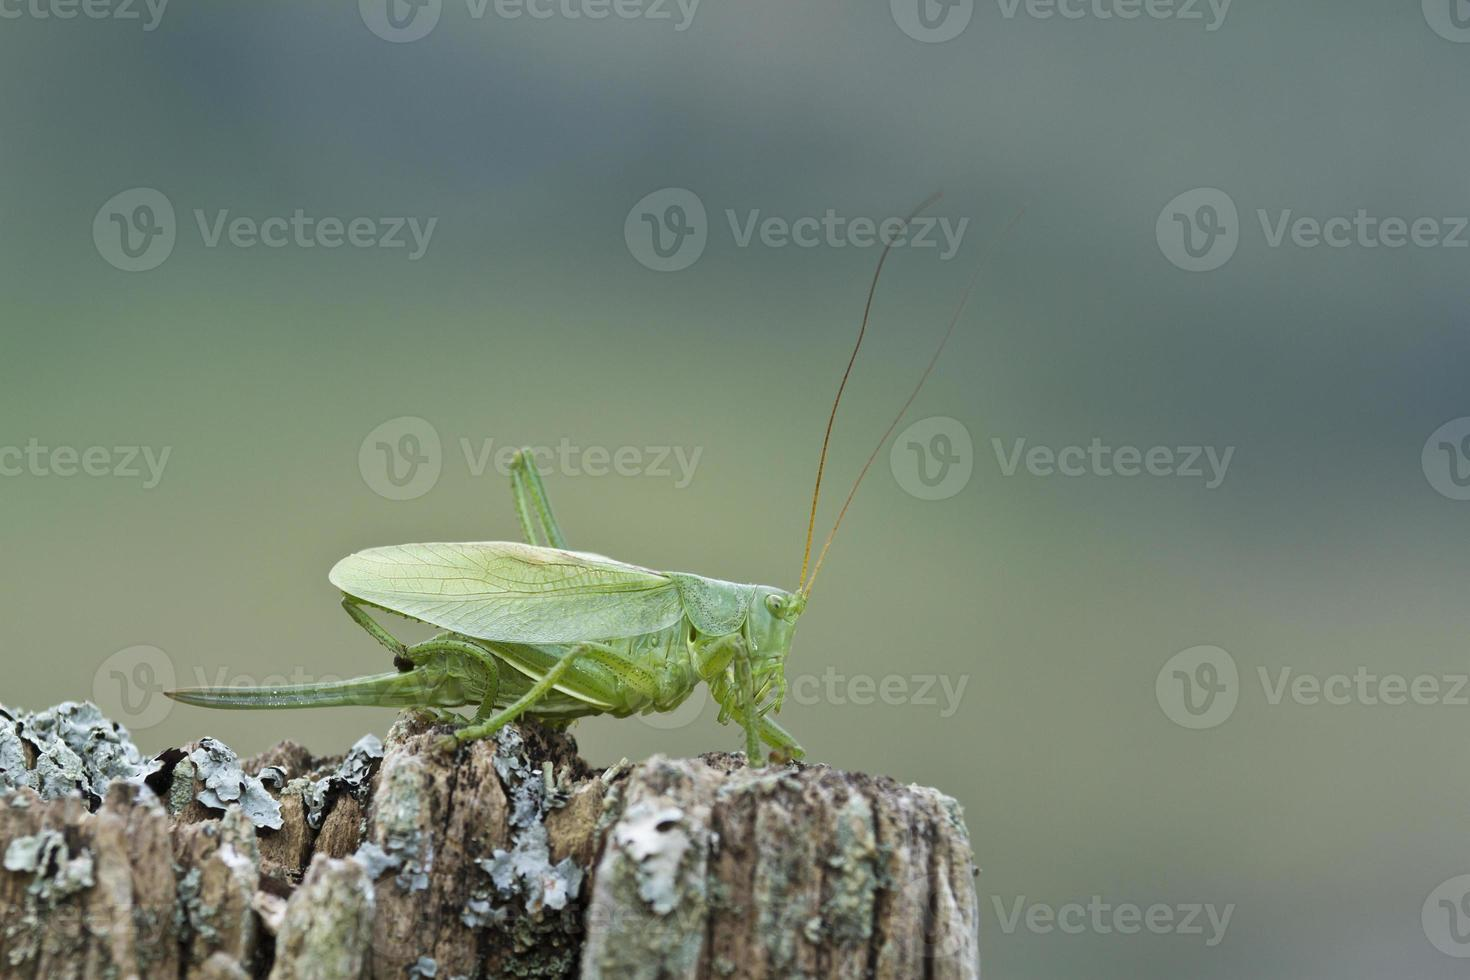 grande espèce de cricket de brousse verte tettigonia viridissima, france photo